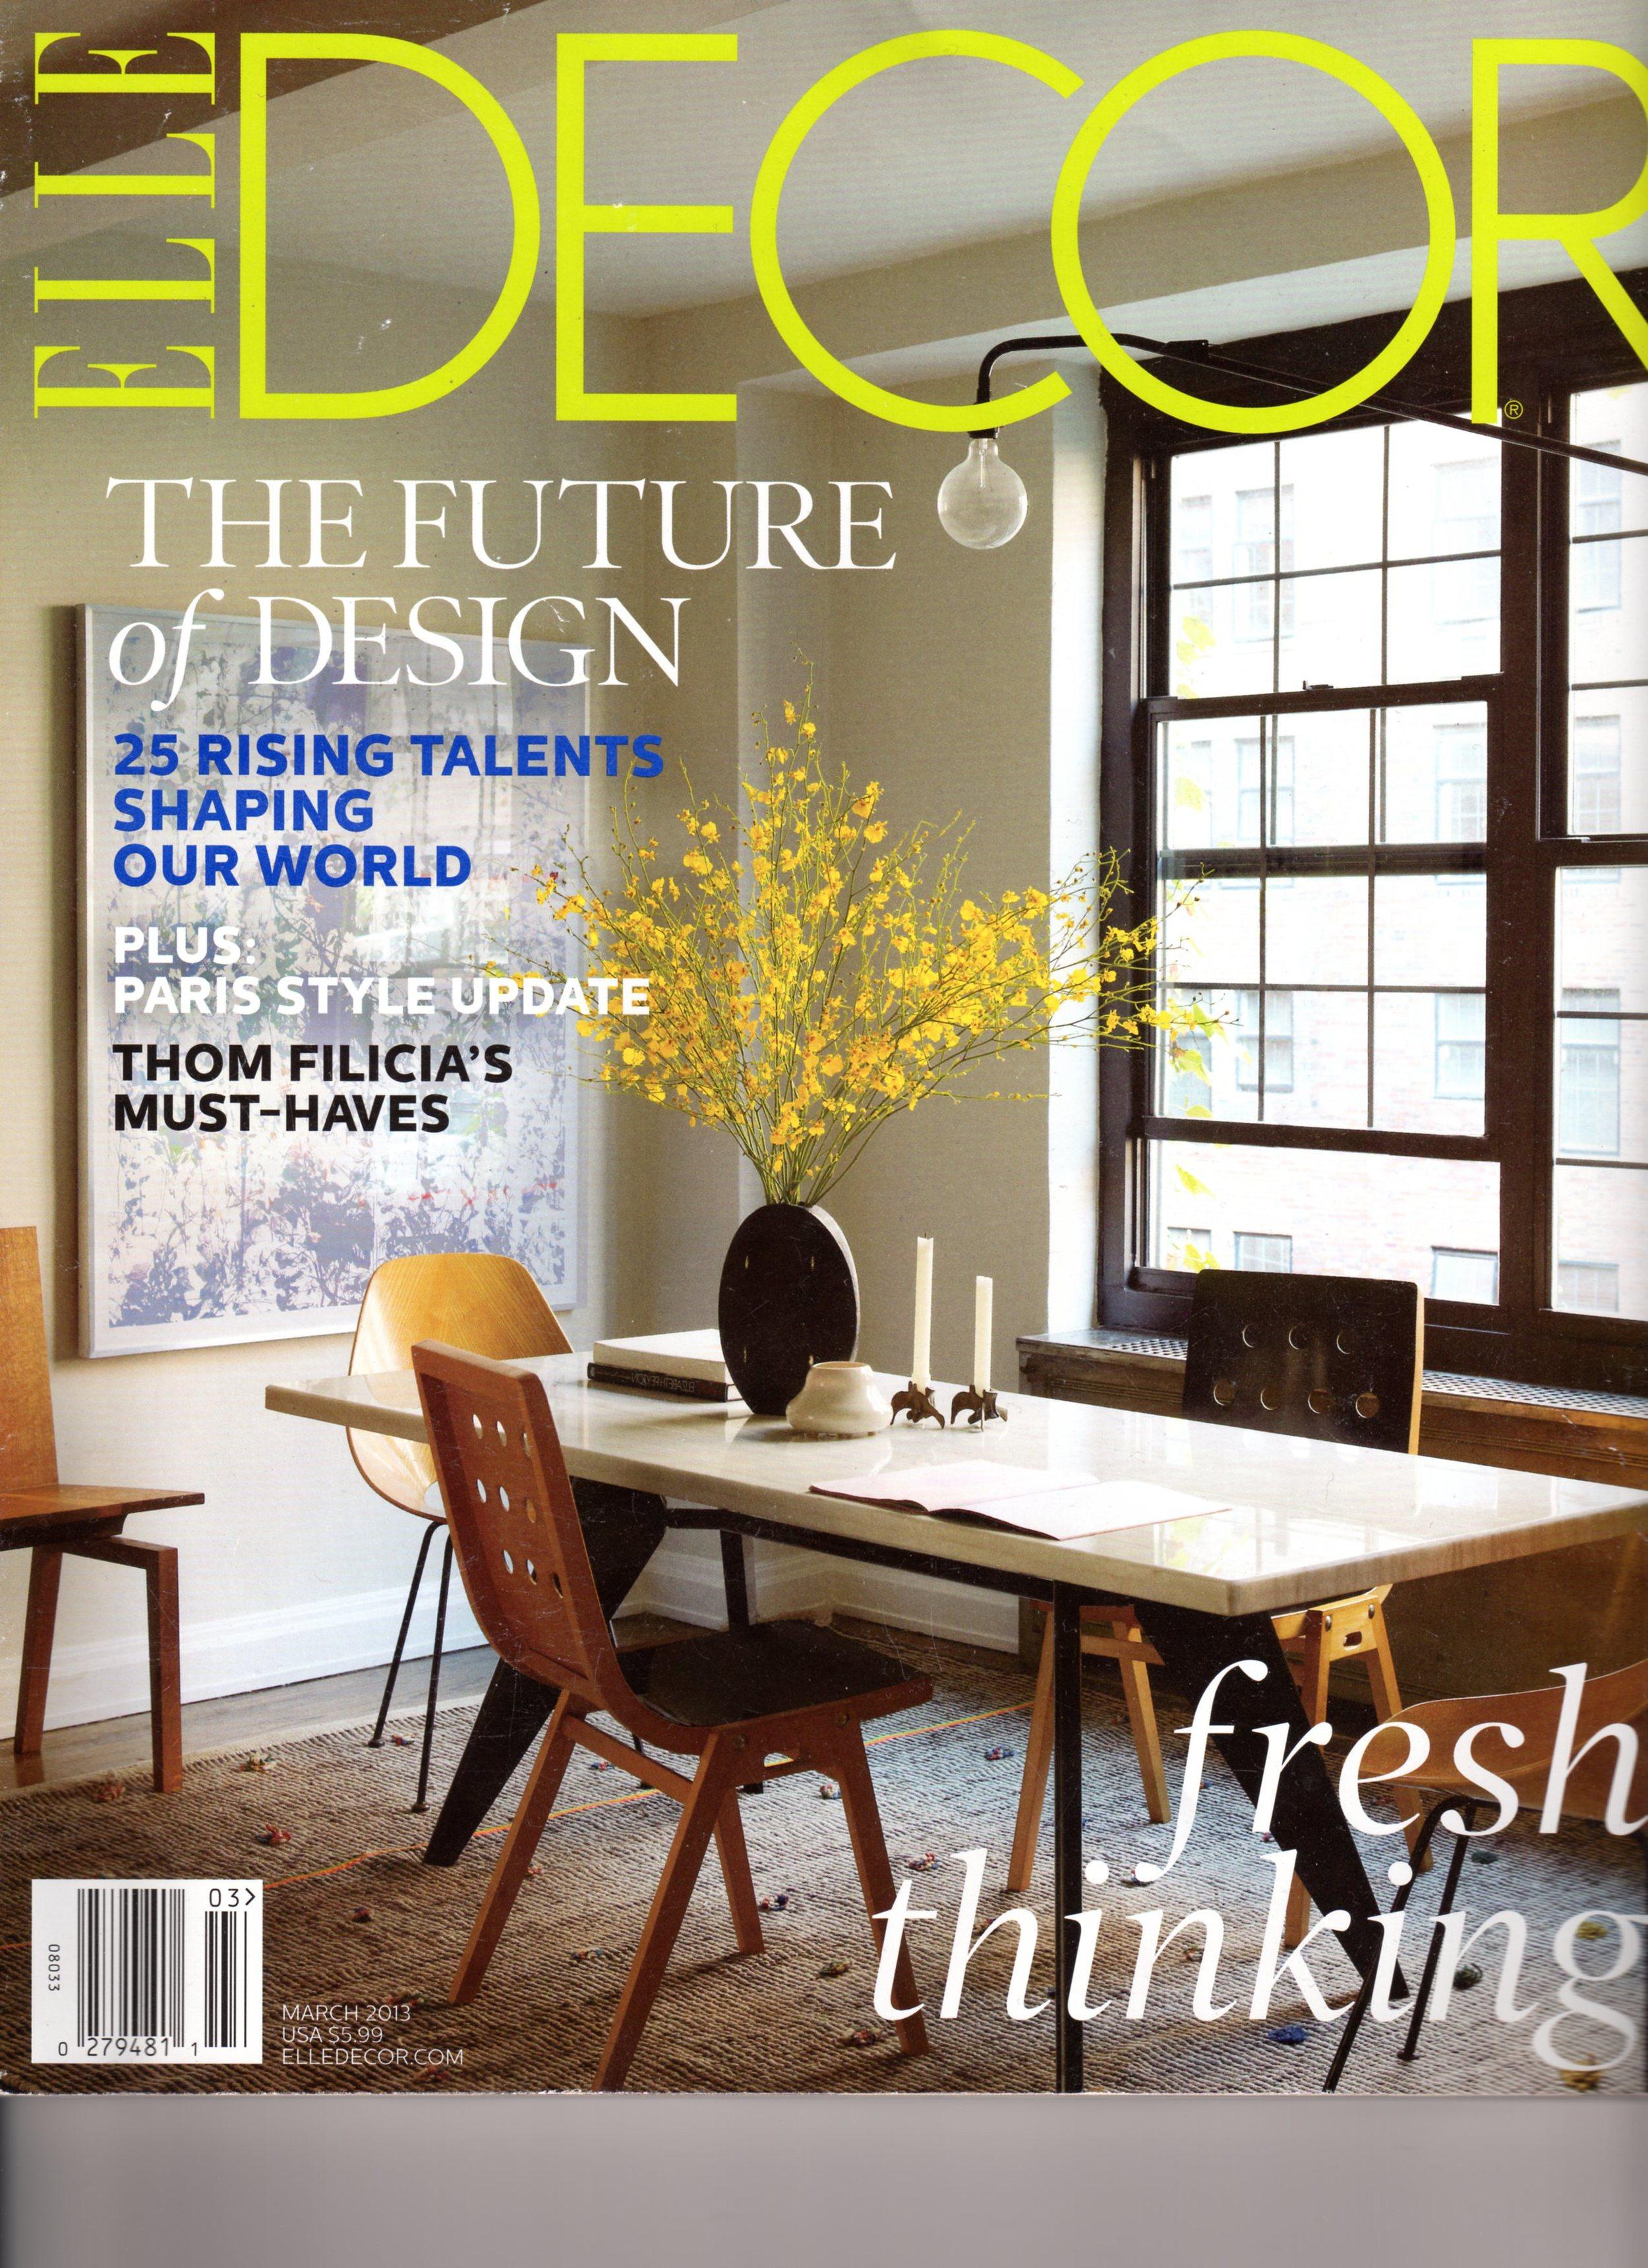 Elle Decor March 2013 cover.jpg